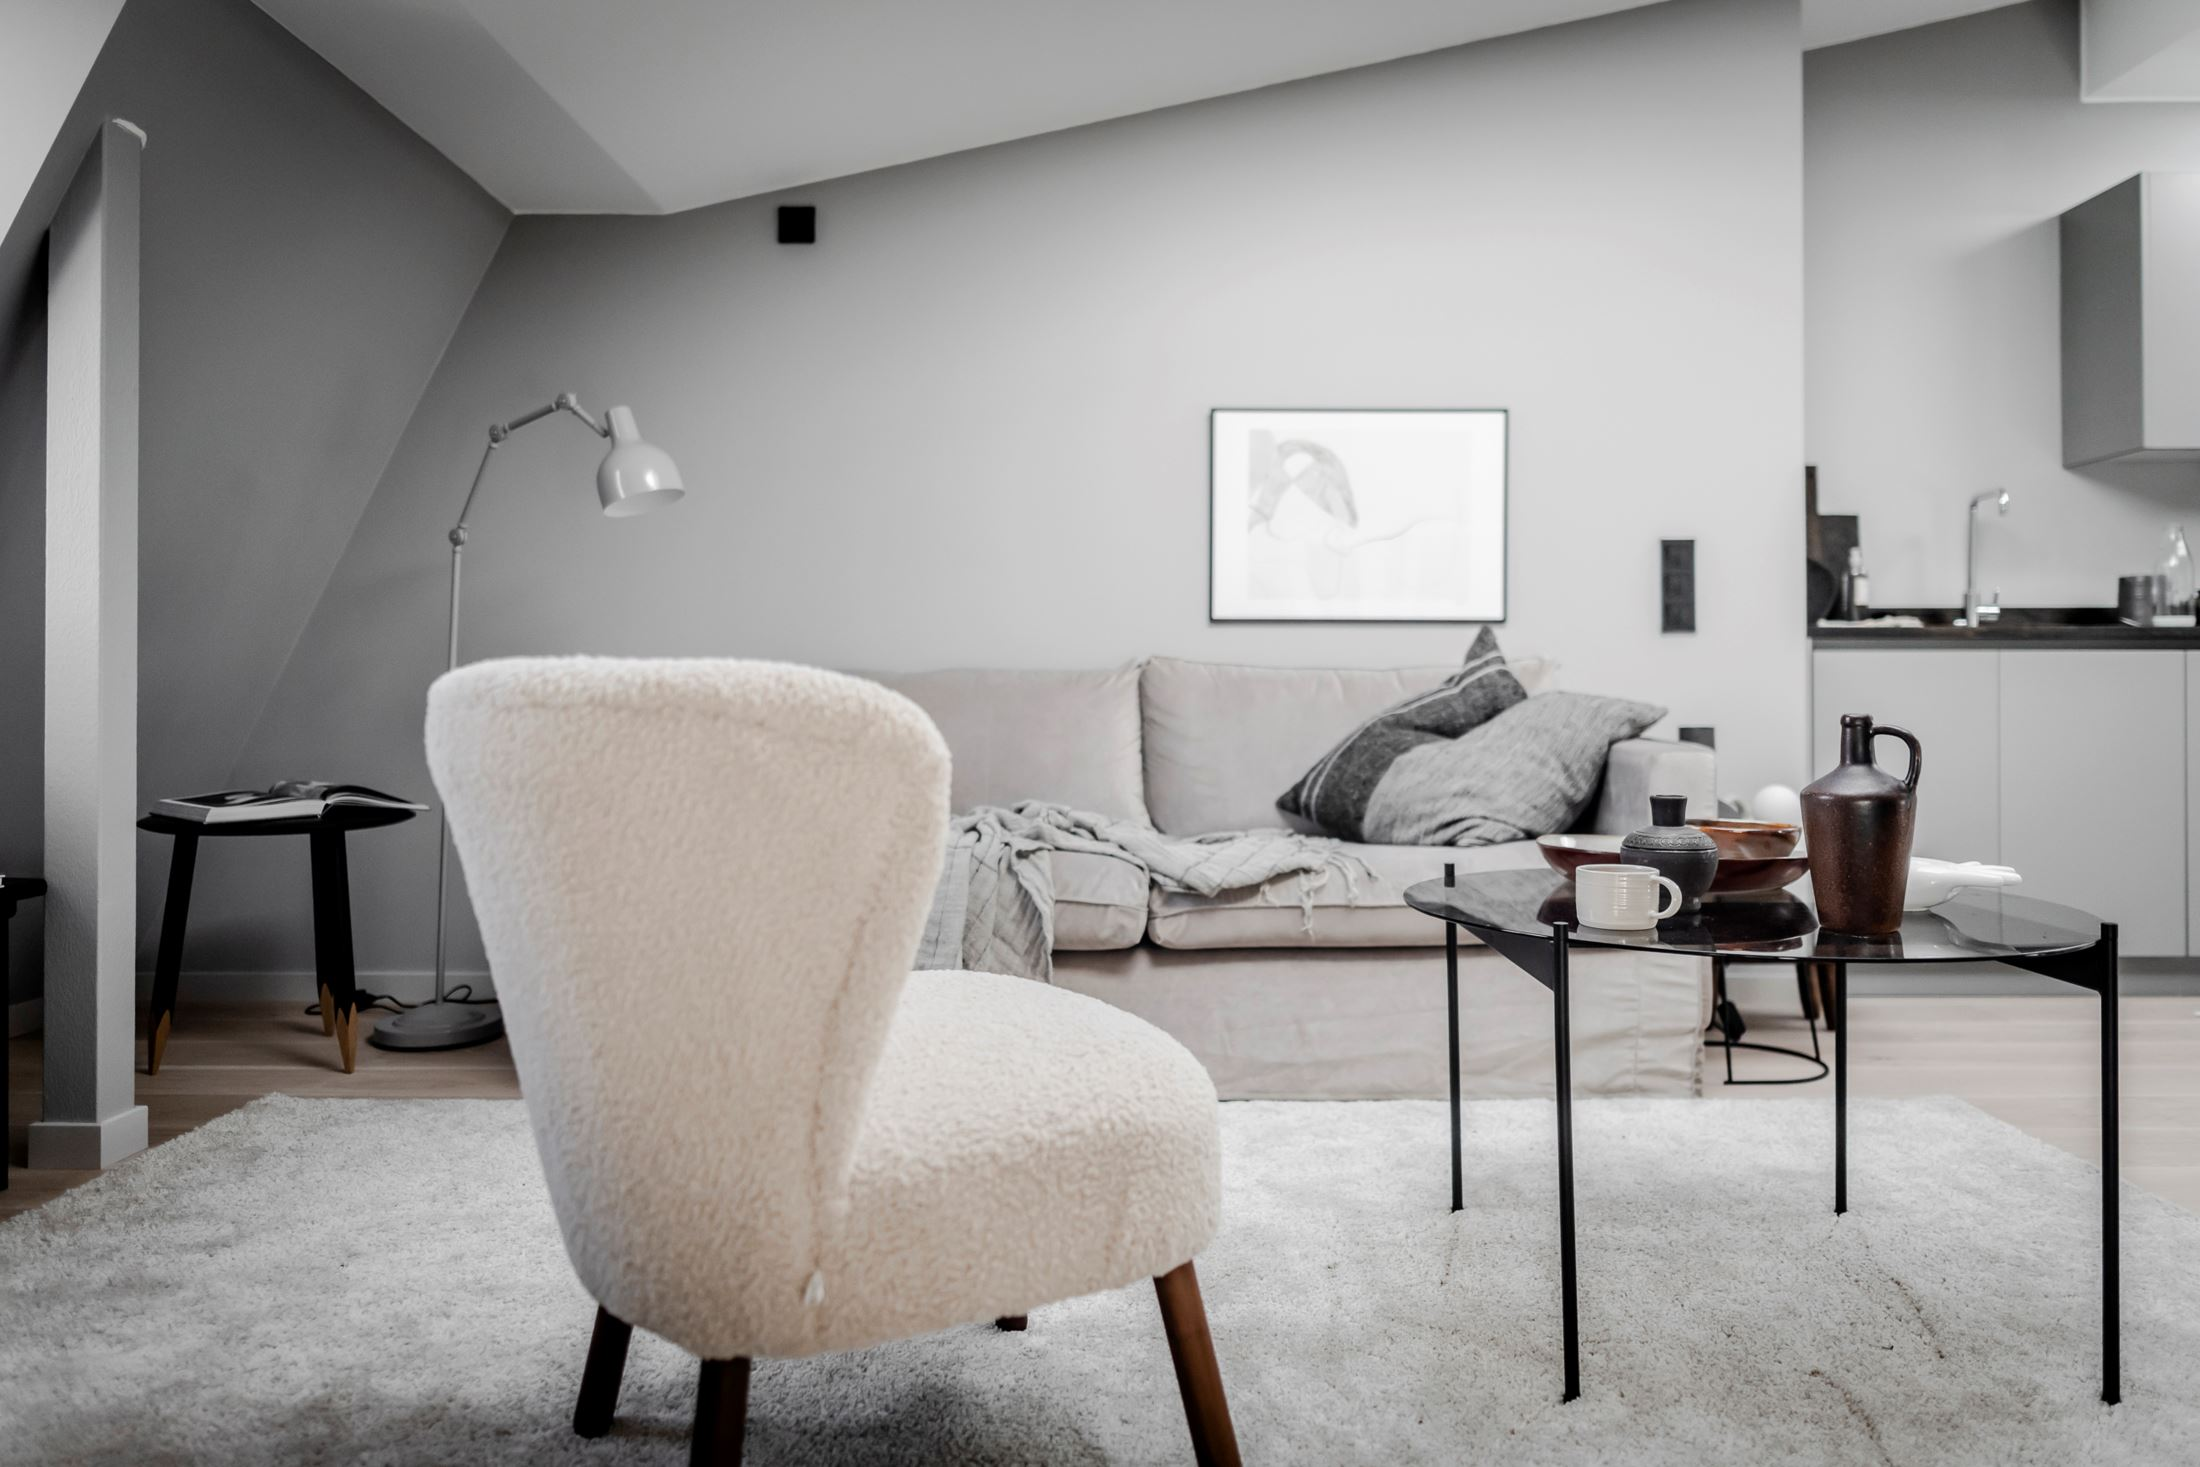 Plan deschis și decor nordic într o garsonieră la mansardă 35 m² 10